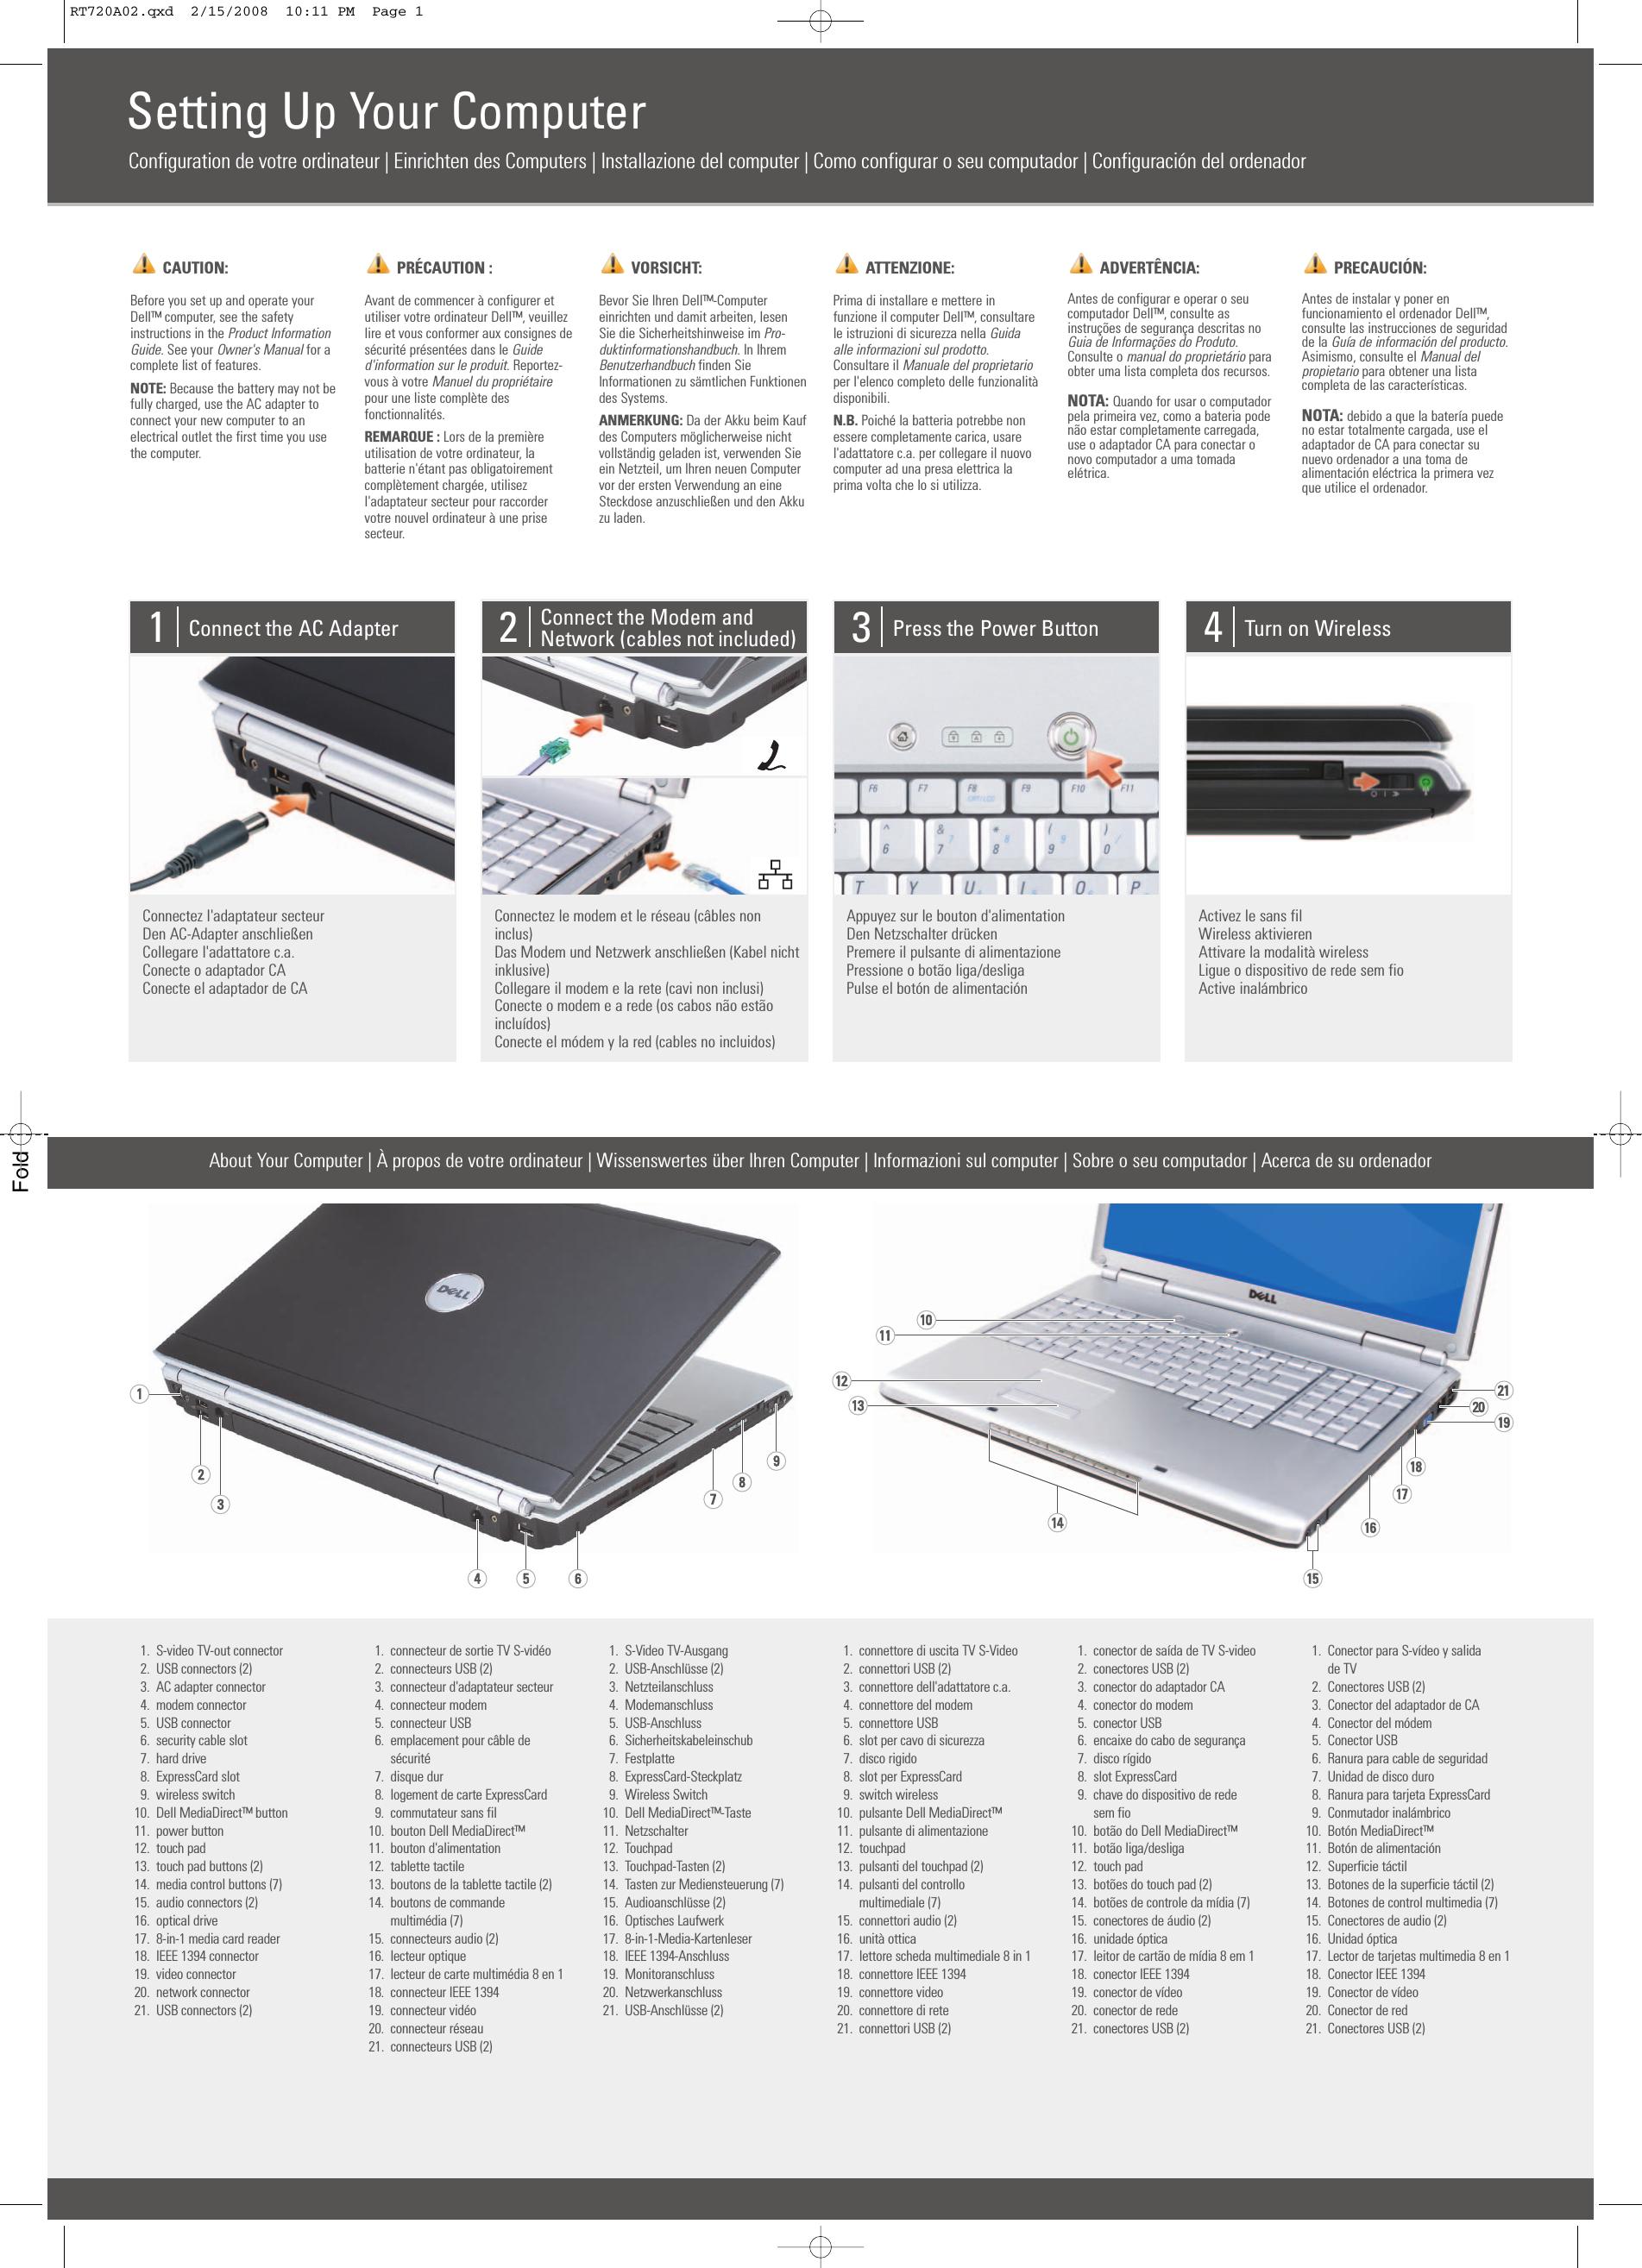 Dell Inspiron 1720 Setup Diagram